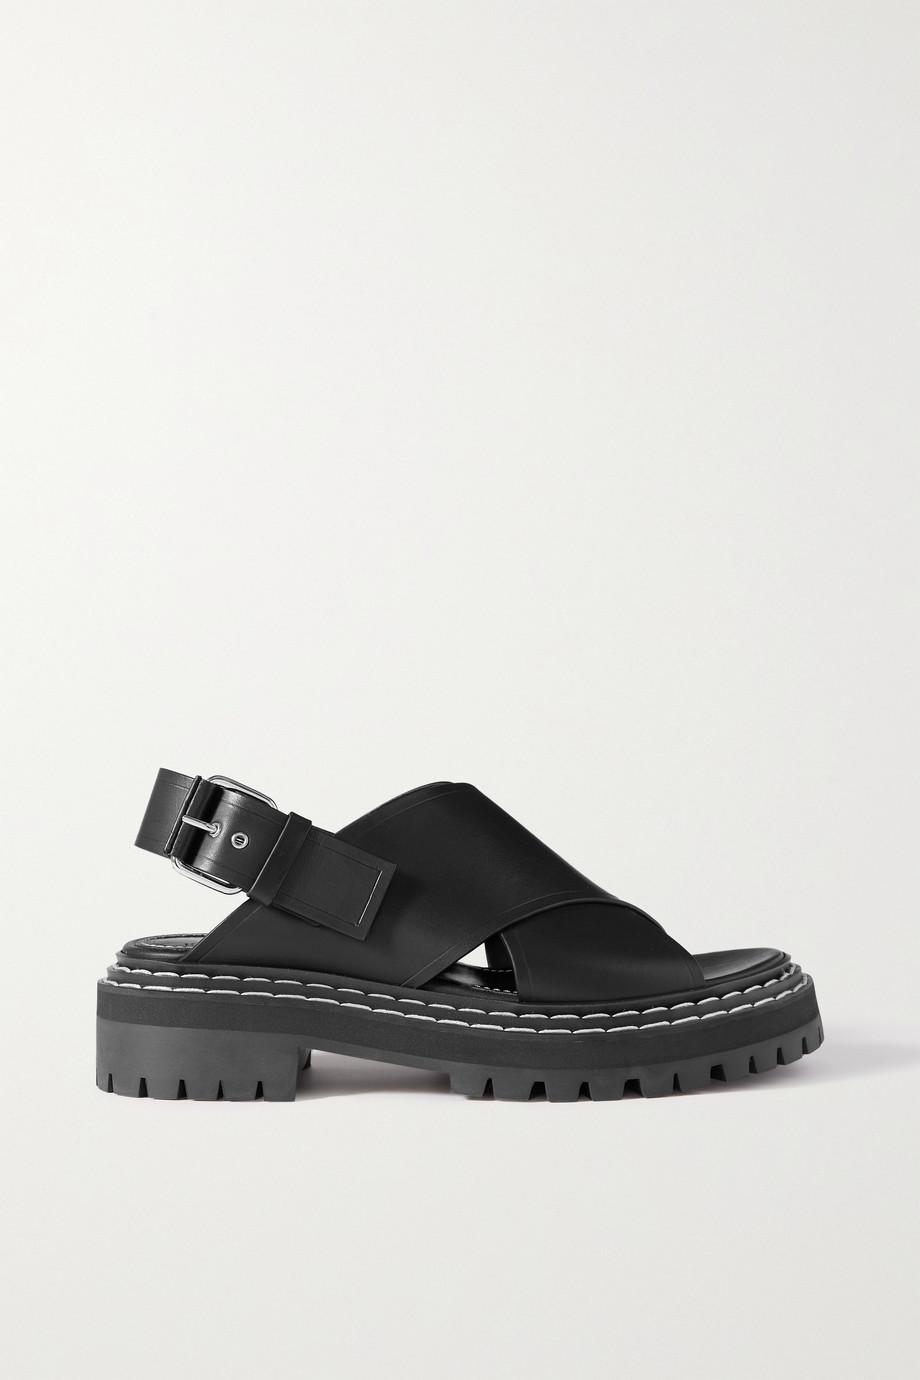 Proenza Schouler Slingback-Sandalen aus Leder